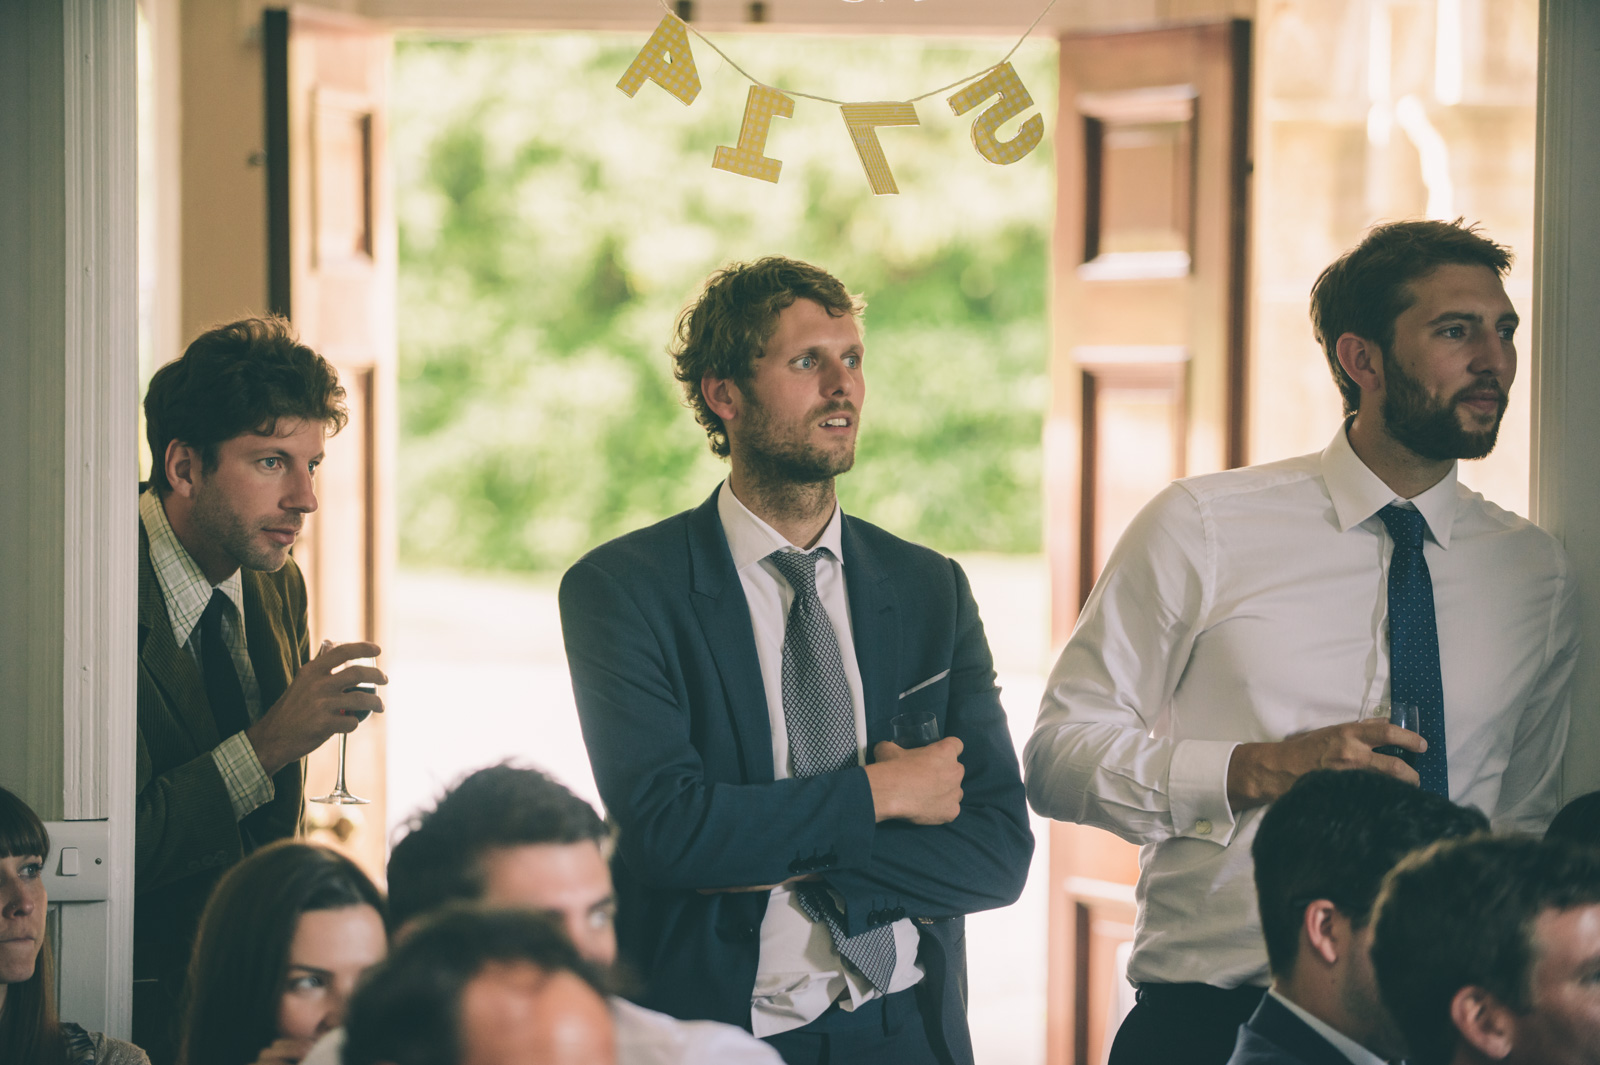 scorrier-house-wedding-photography-128.jpg